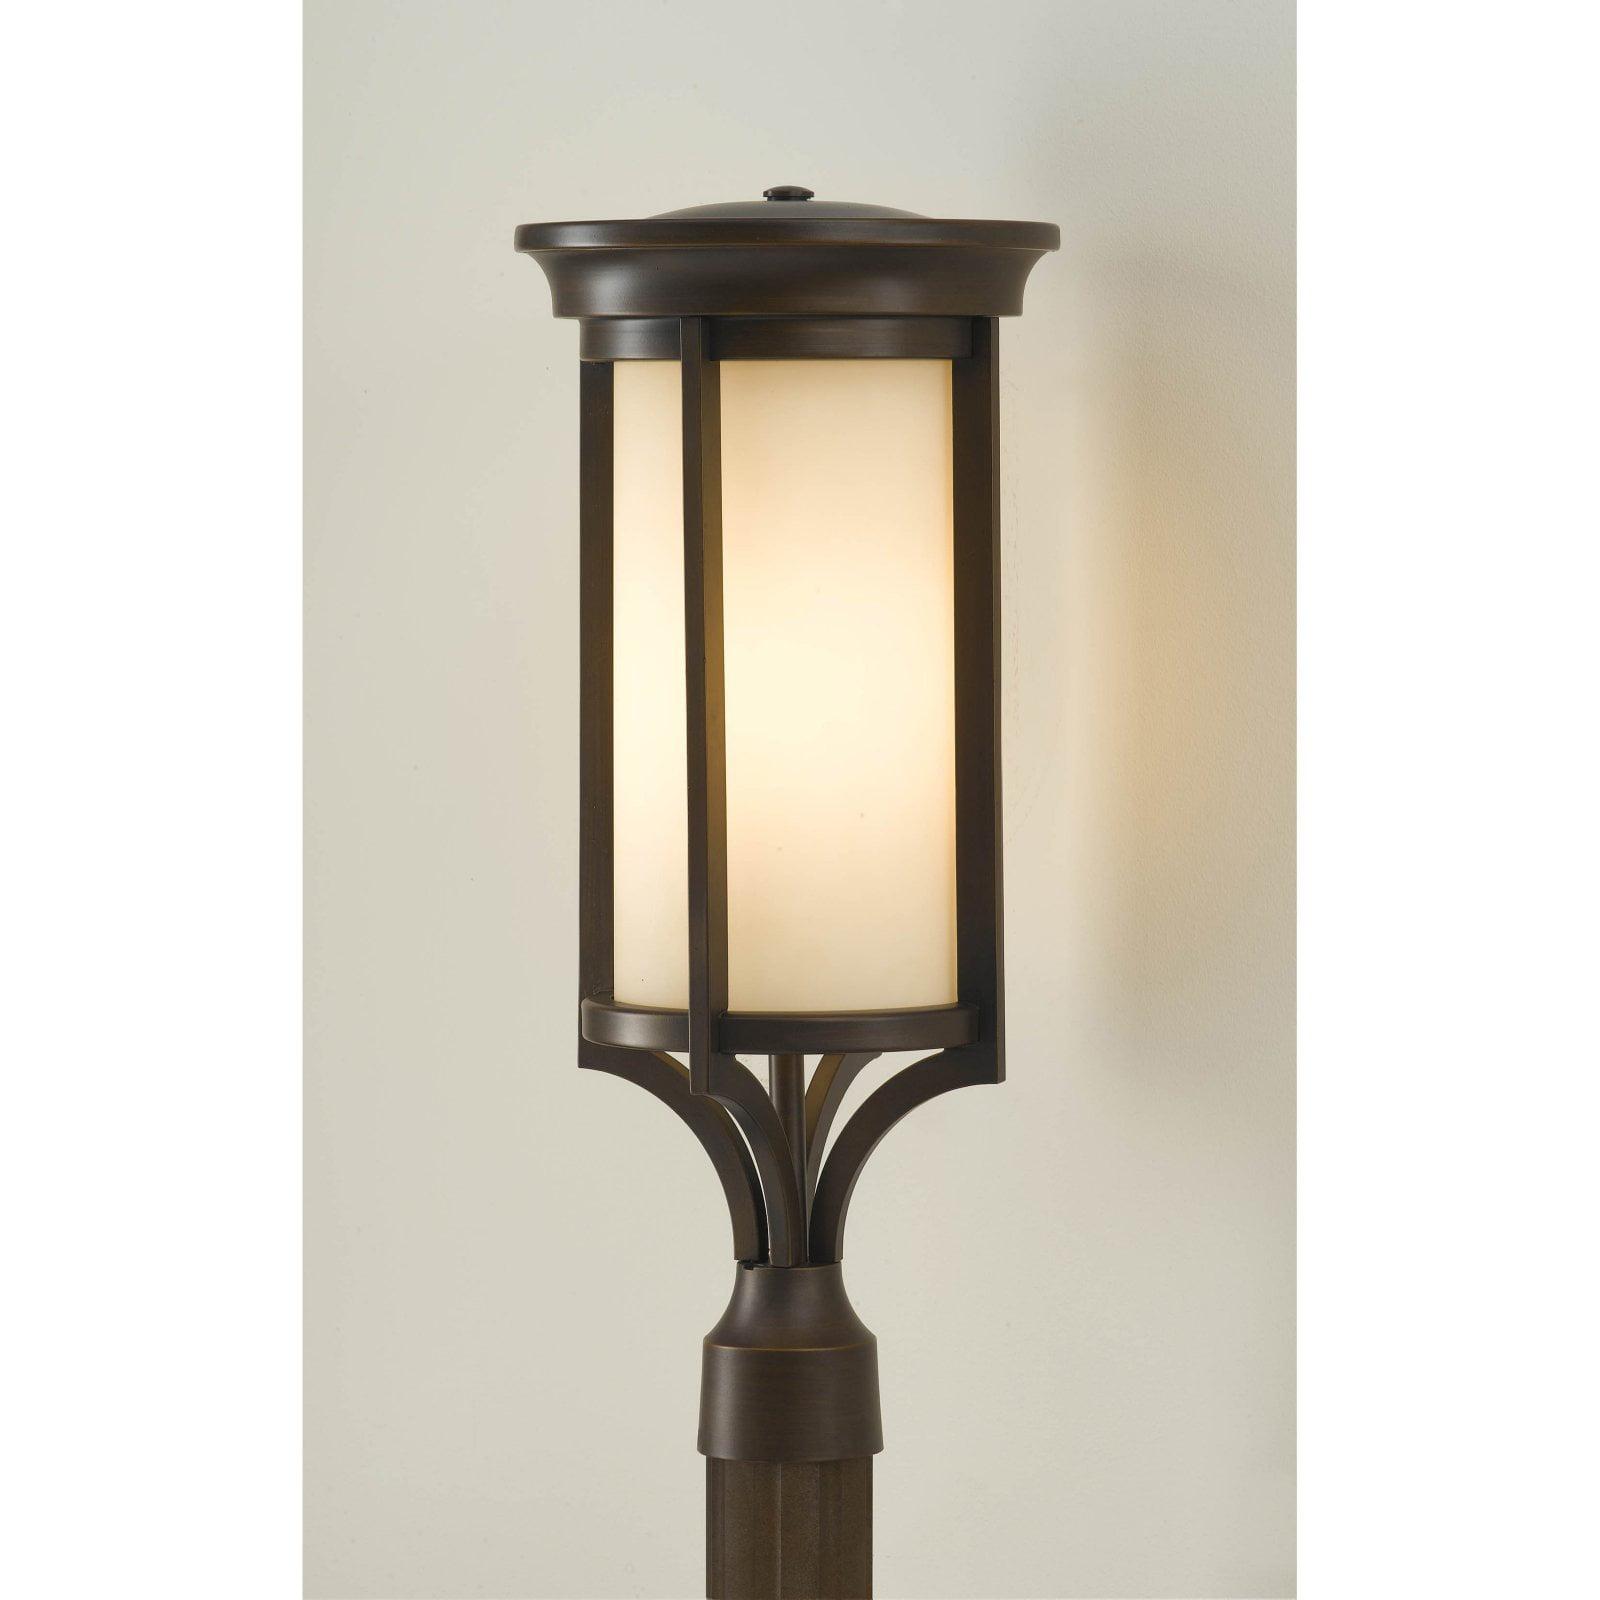 Feiss Merrill OL7507HTBZ Outdoor Post Lantern 9.5W in. Heritage Bronze by Murray Feiss